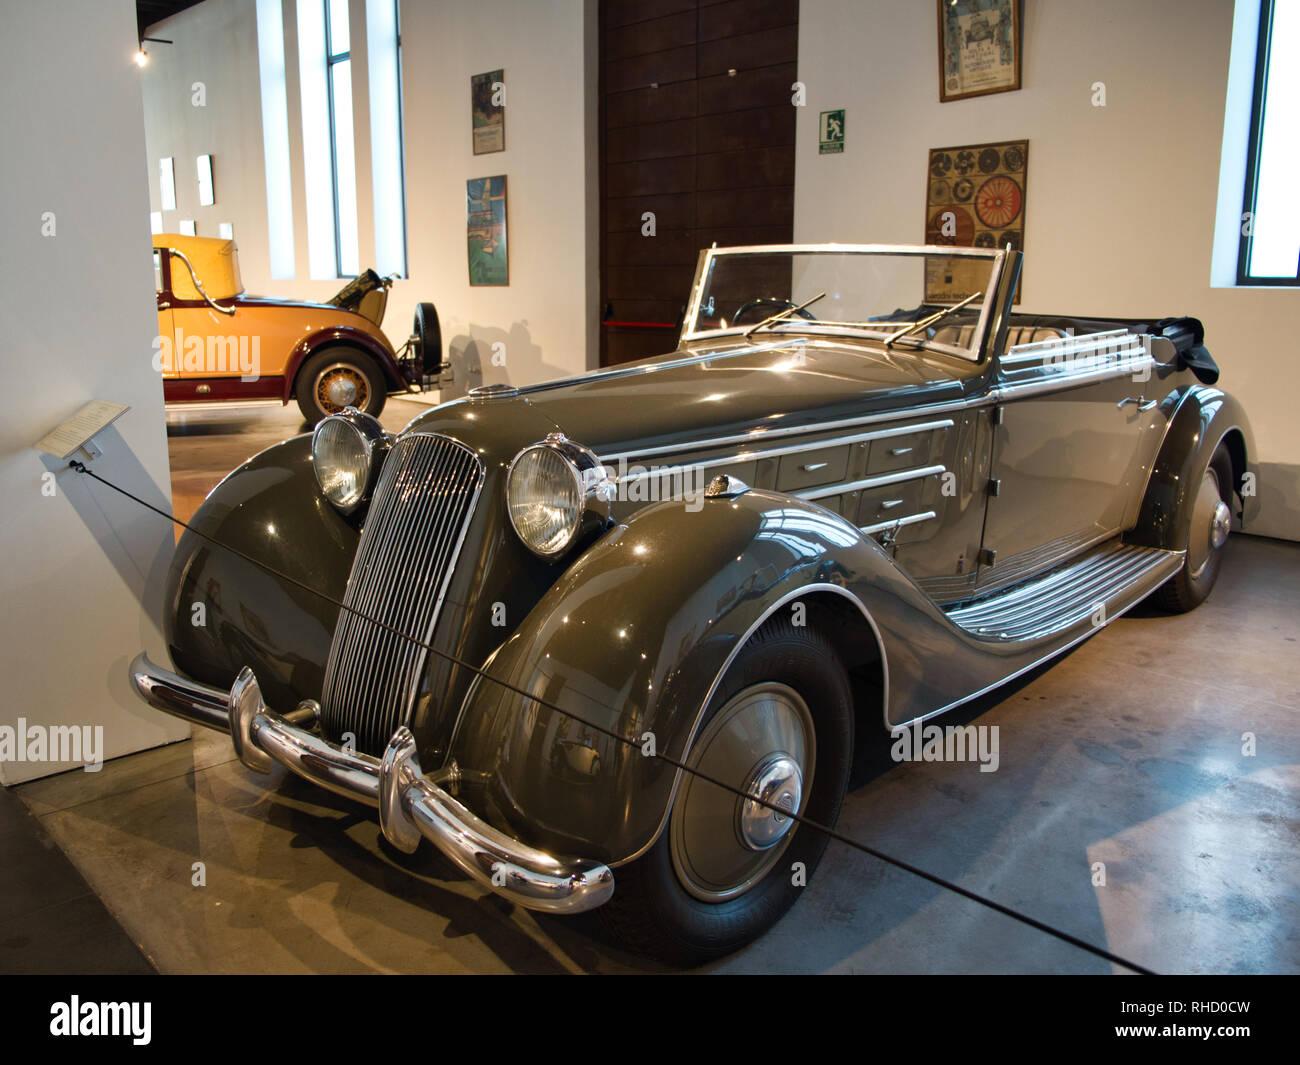 1934 Lancia Dilambda, 4000cc V8 100HP. 'Mussolini´s Parade Car'. Automobile museum of Málaga, Spain. - Stock Image